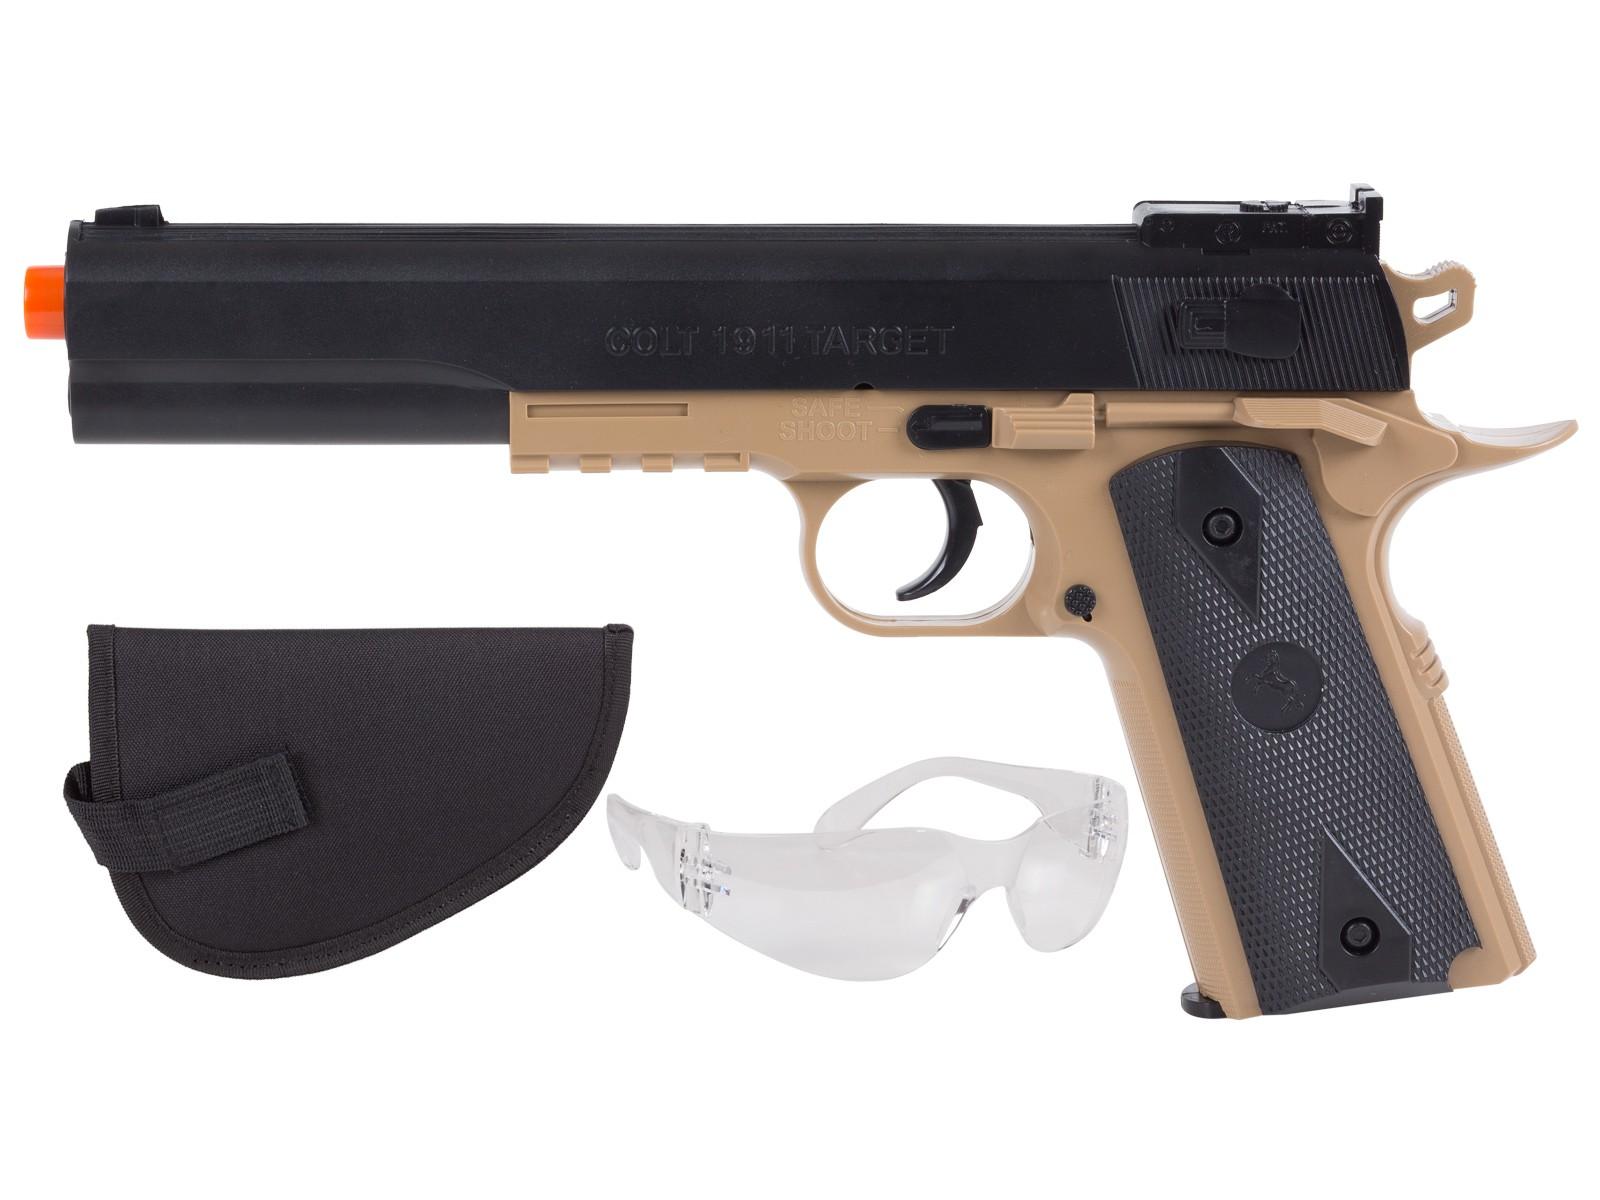 Colt_1911_Spring_Airsoft_Kit__Black_&_Tan_6mm